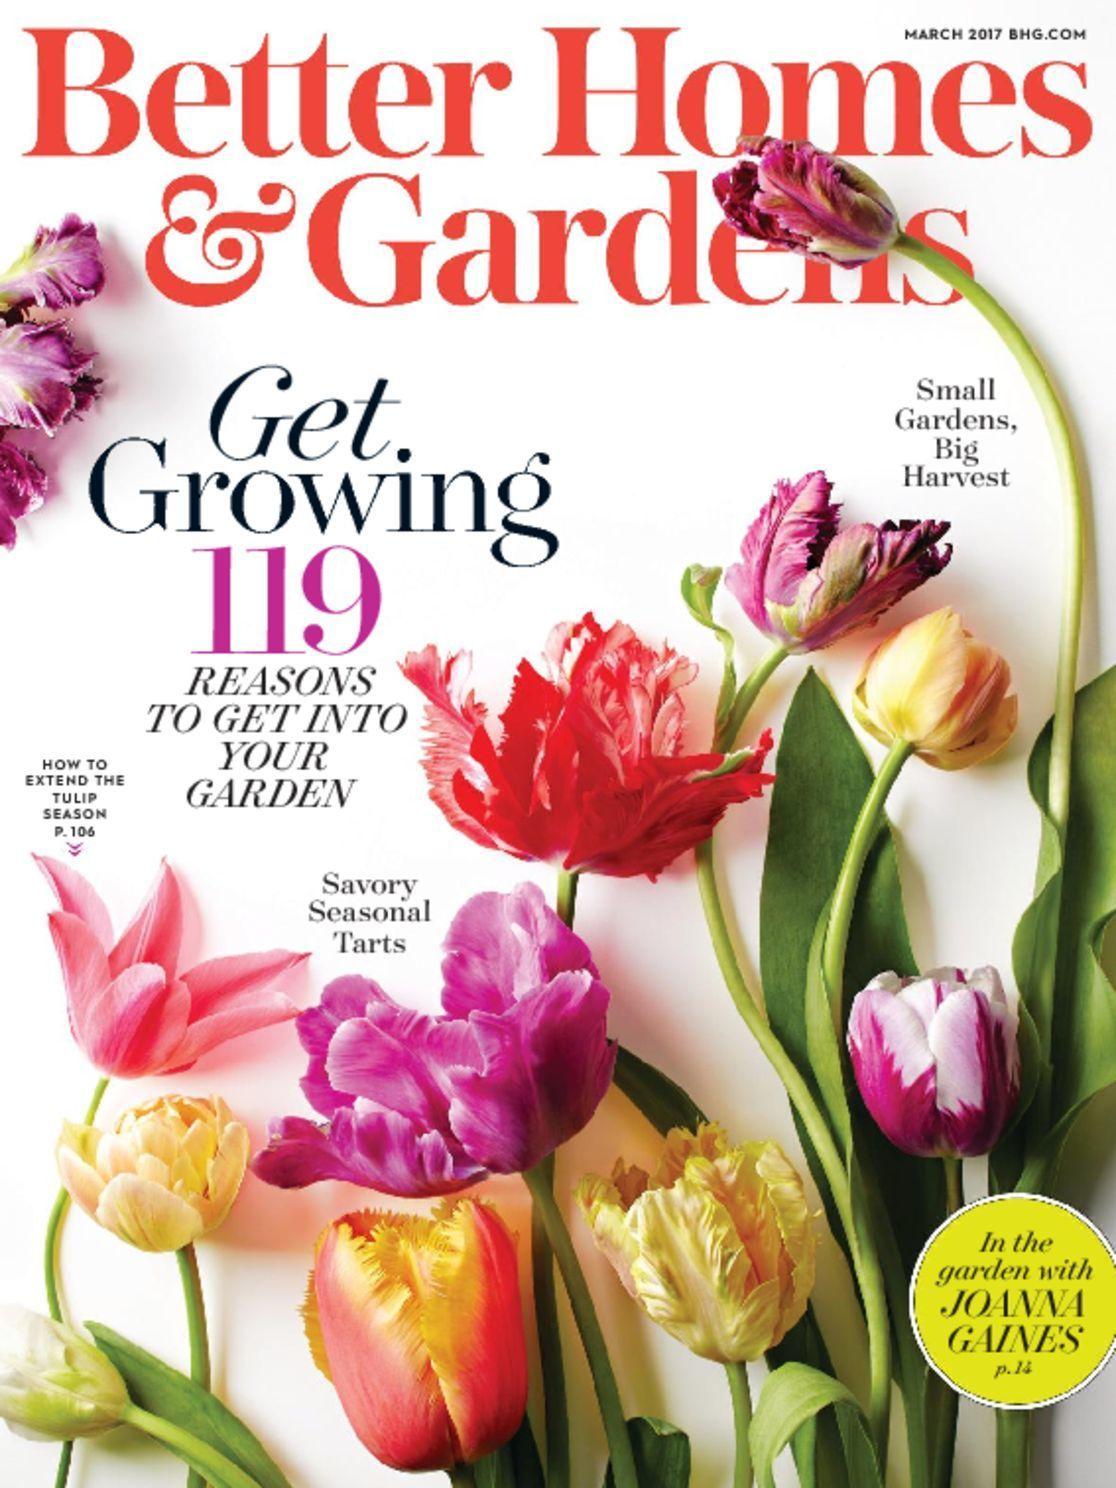 73c3e1d9d320c587879be434de18d9b8 - How To Cancel Better Homes And Gardens Subscription